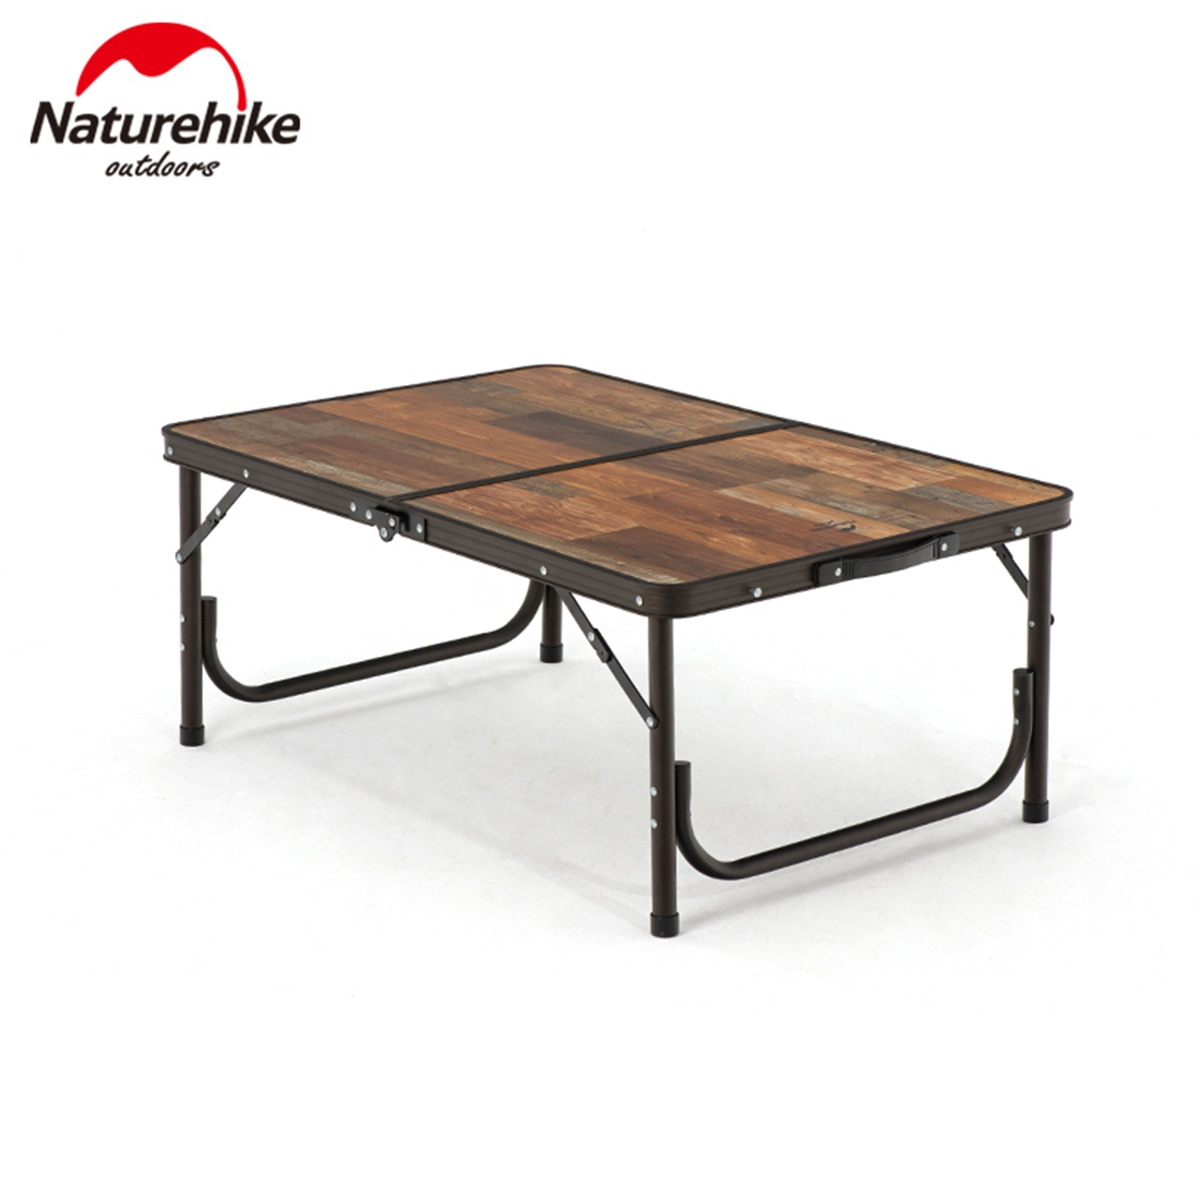 Naturehike Ultralight Foldable Table Aluminum BBQ Furniture Folding Desk For Outdoor Camping Hiking Travel BBQ Desk NH20JJ028